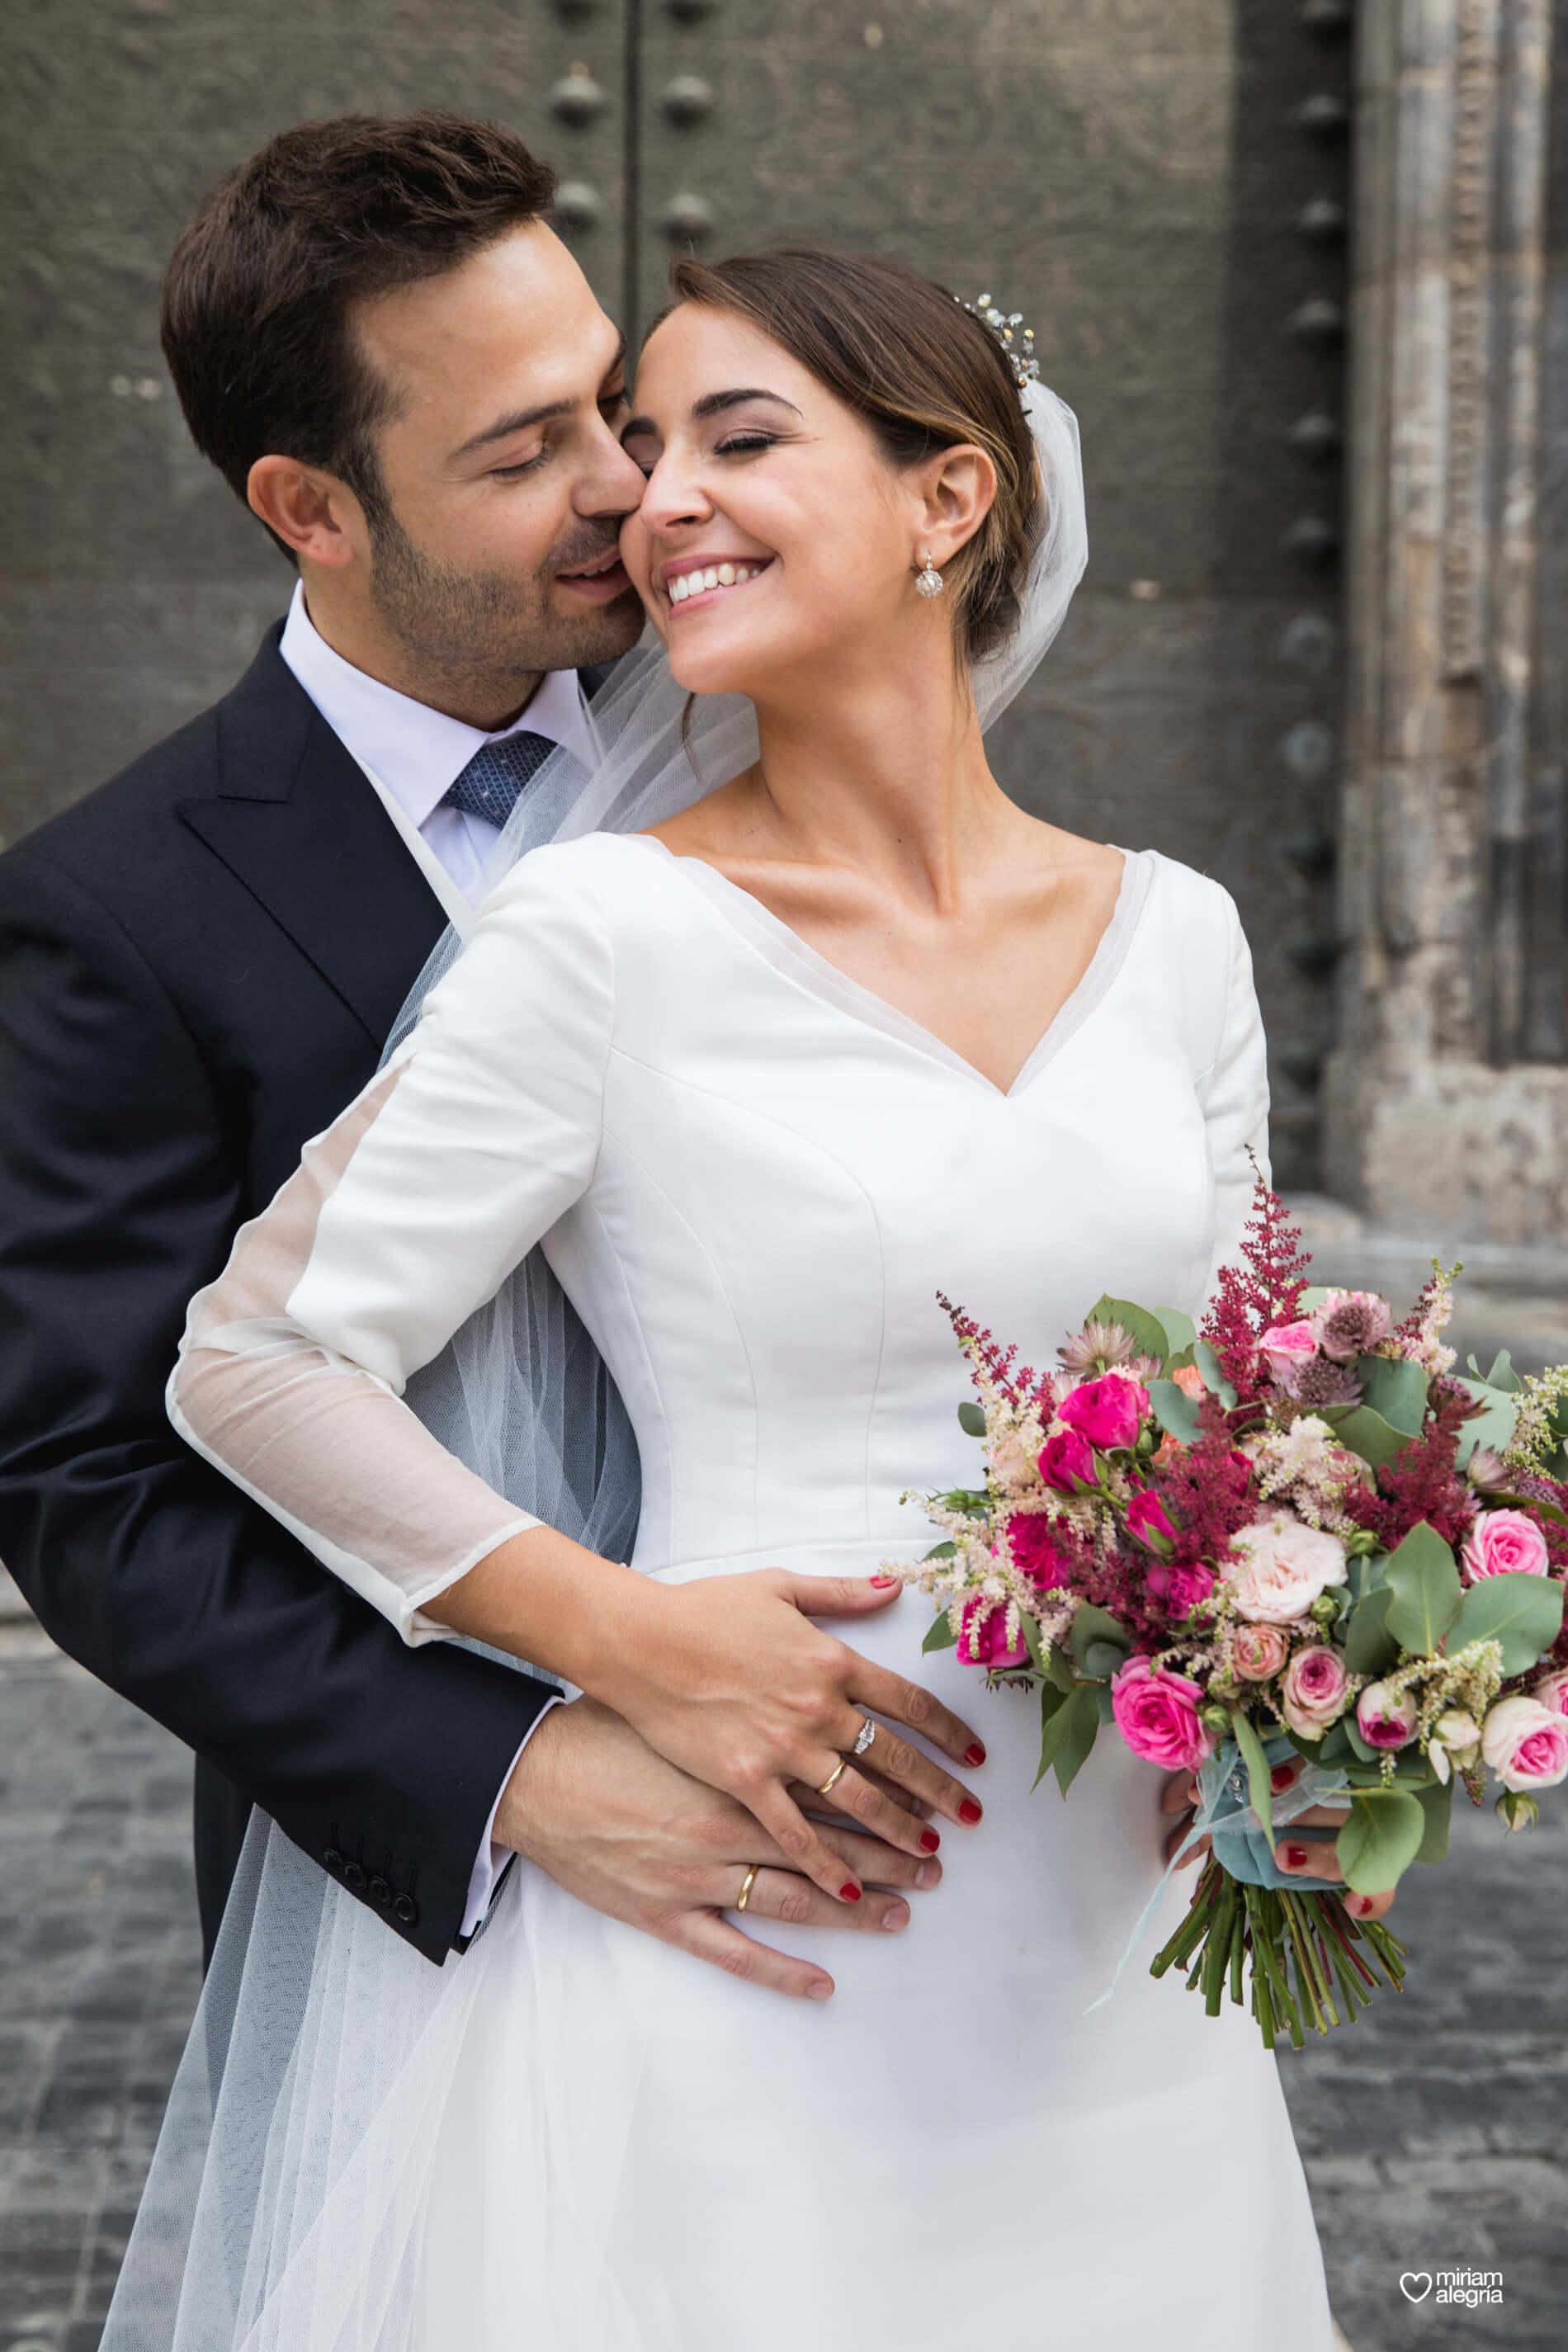 vestido-de-novia-paula-del-vas-miriam-alegria-fotografos-boda-murcia-93